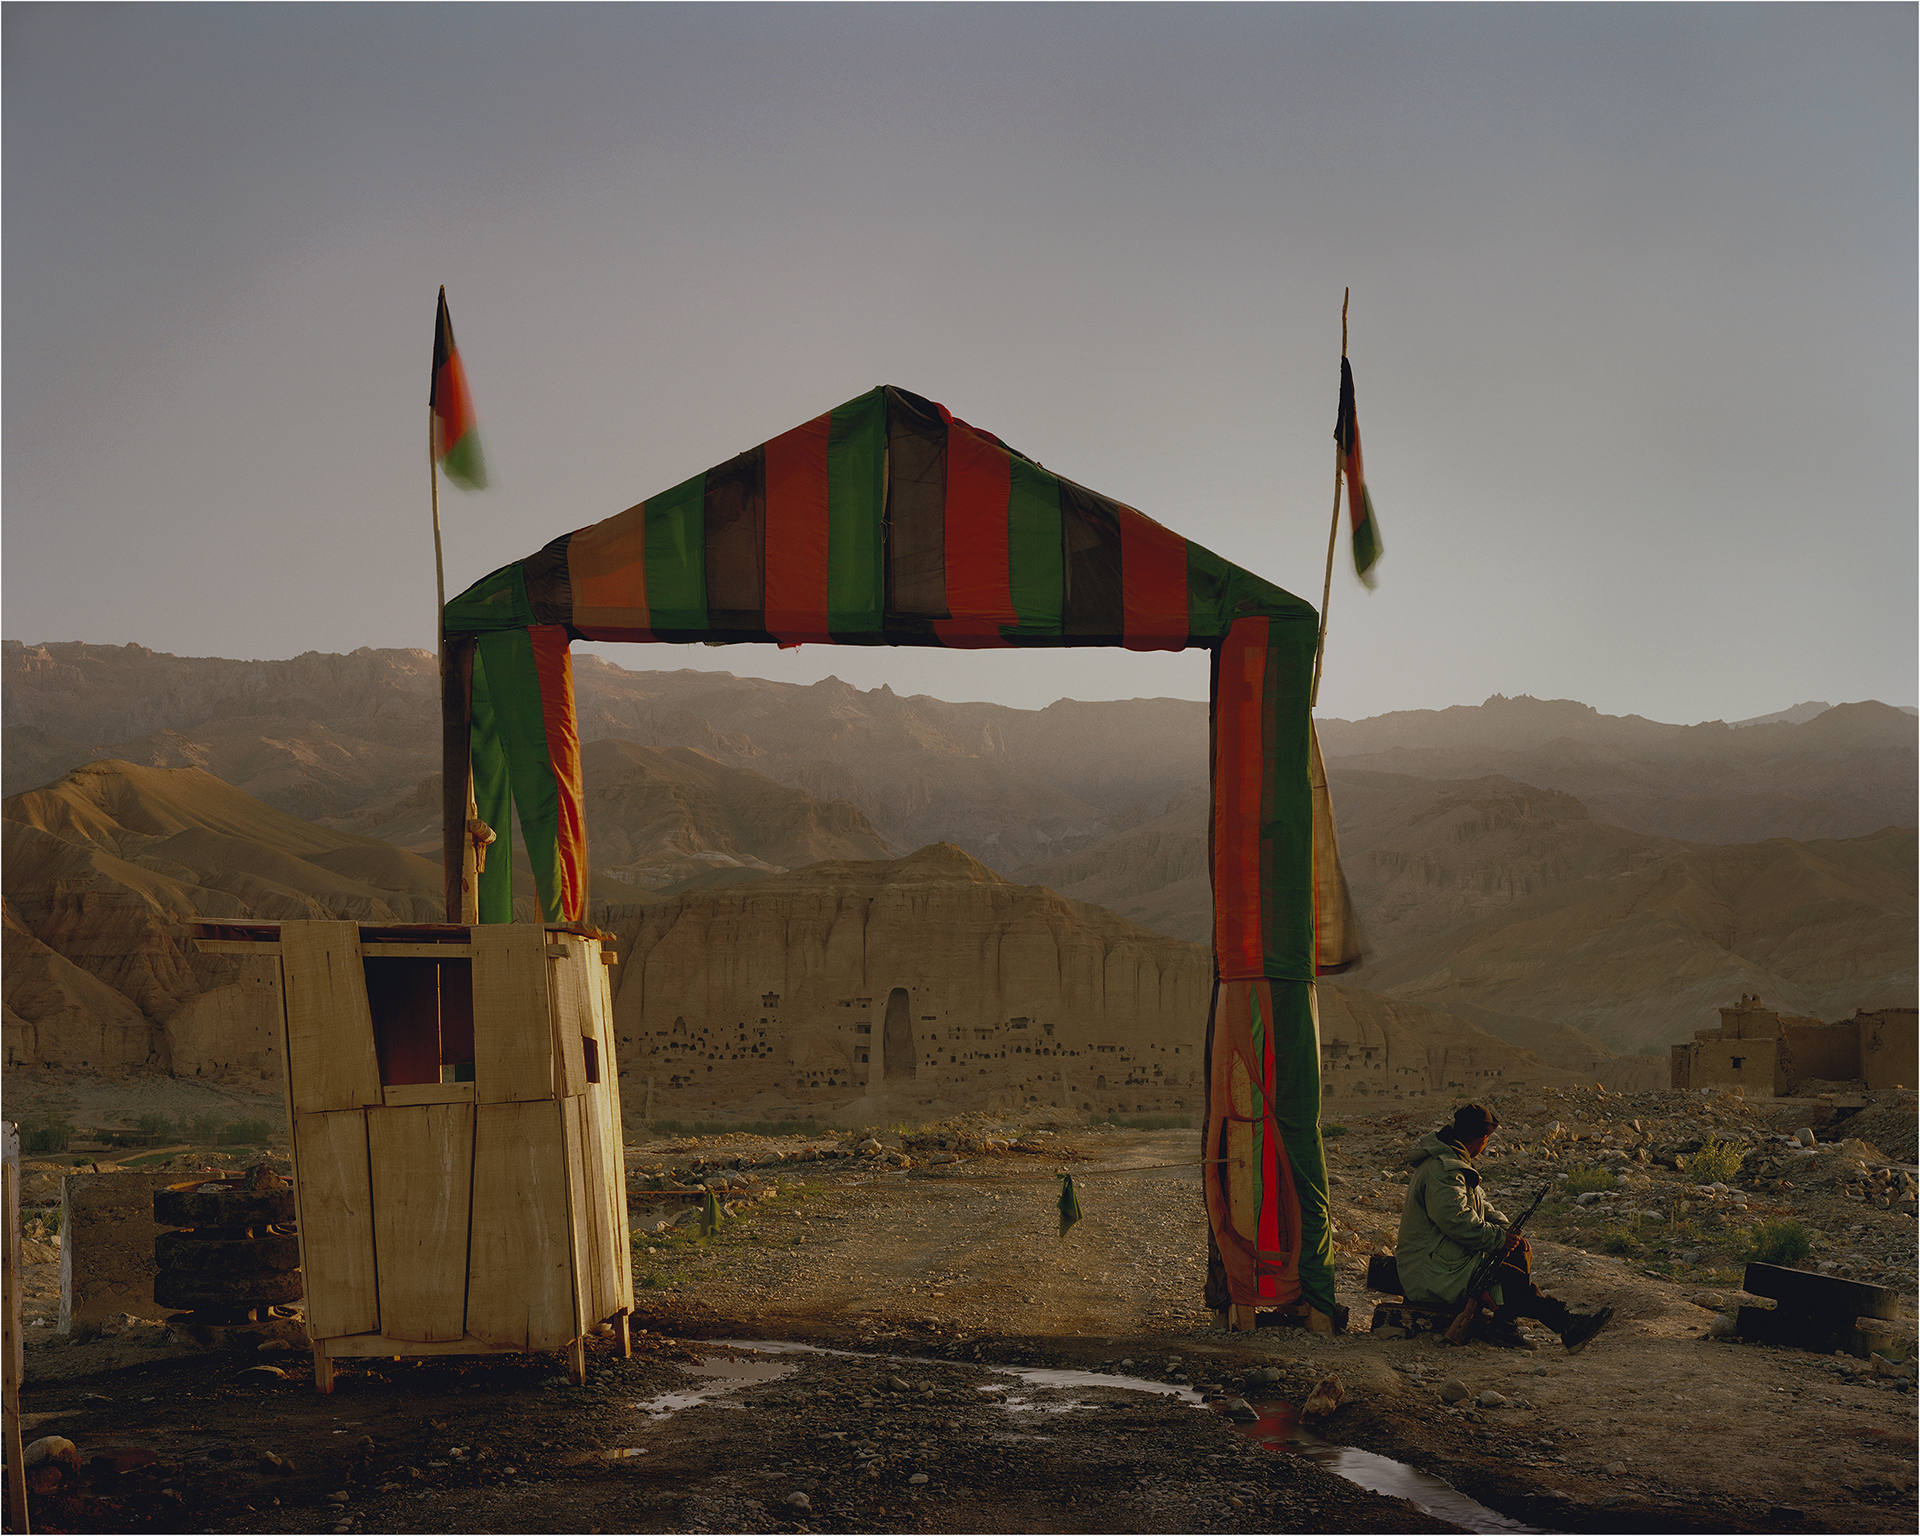 Bamiyan Victory Arch